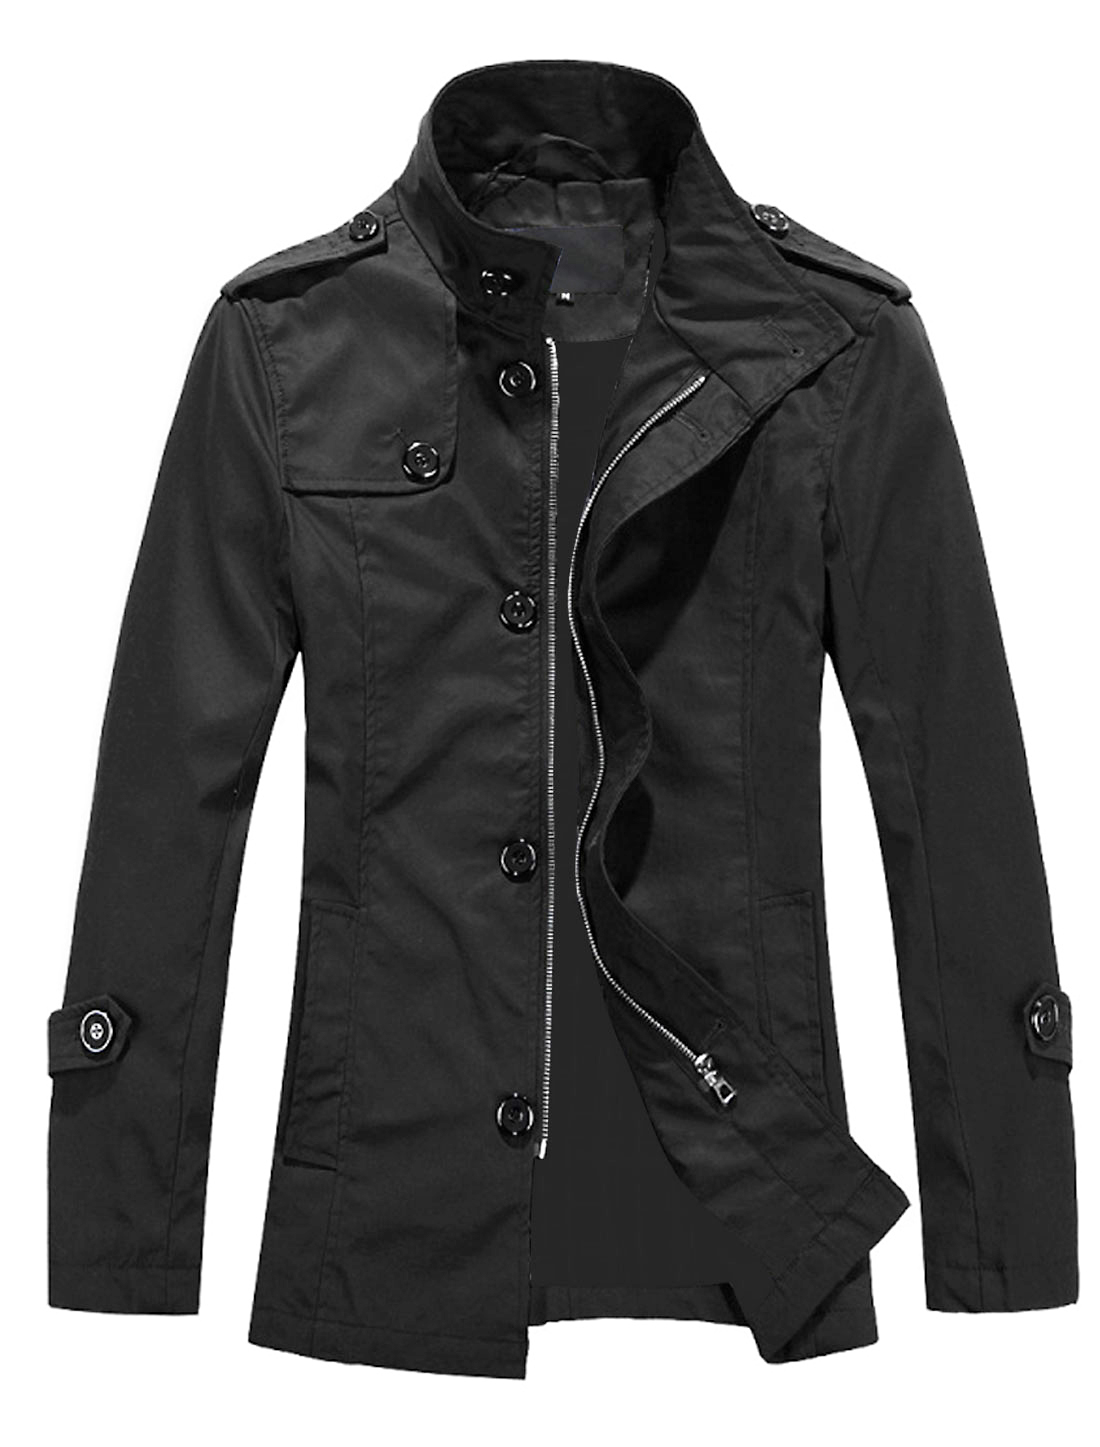 Men Fashion Convertible Collar Gun Flap Detail Front Trench Coat Black M